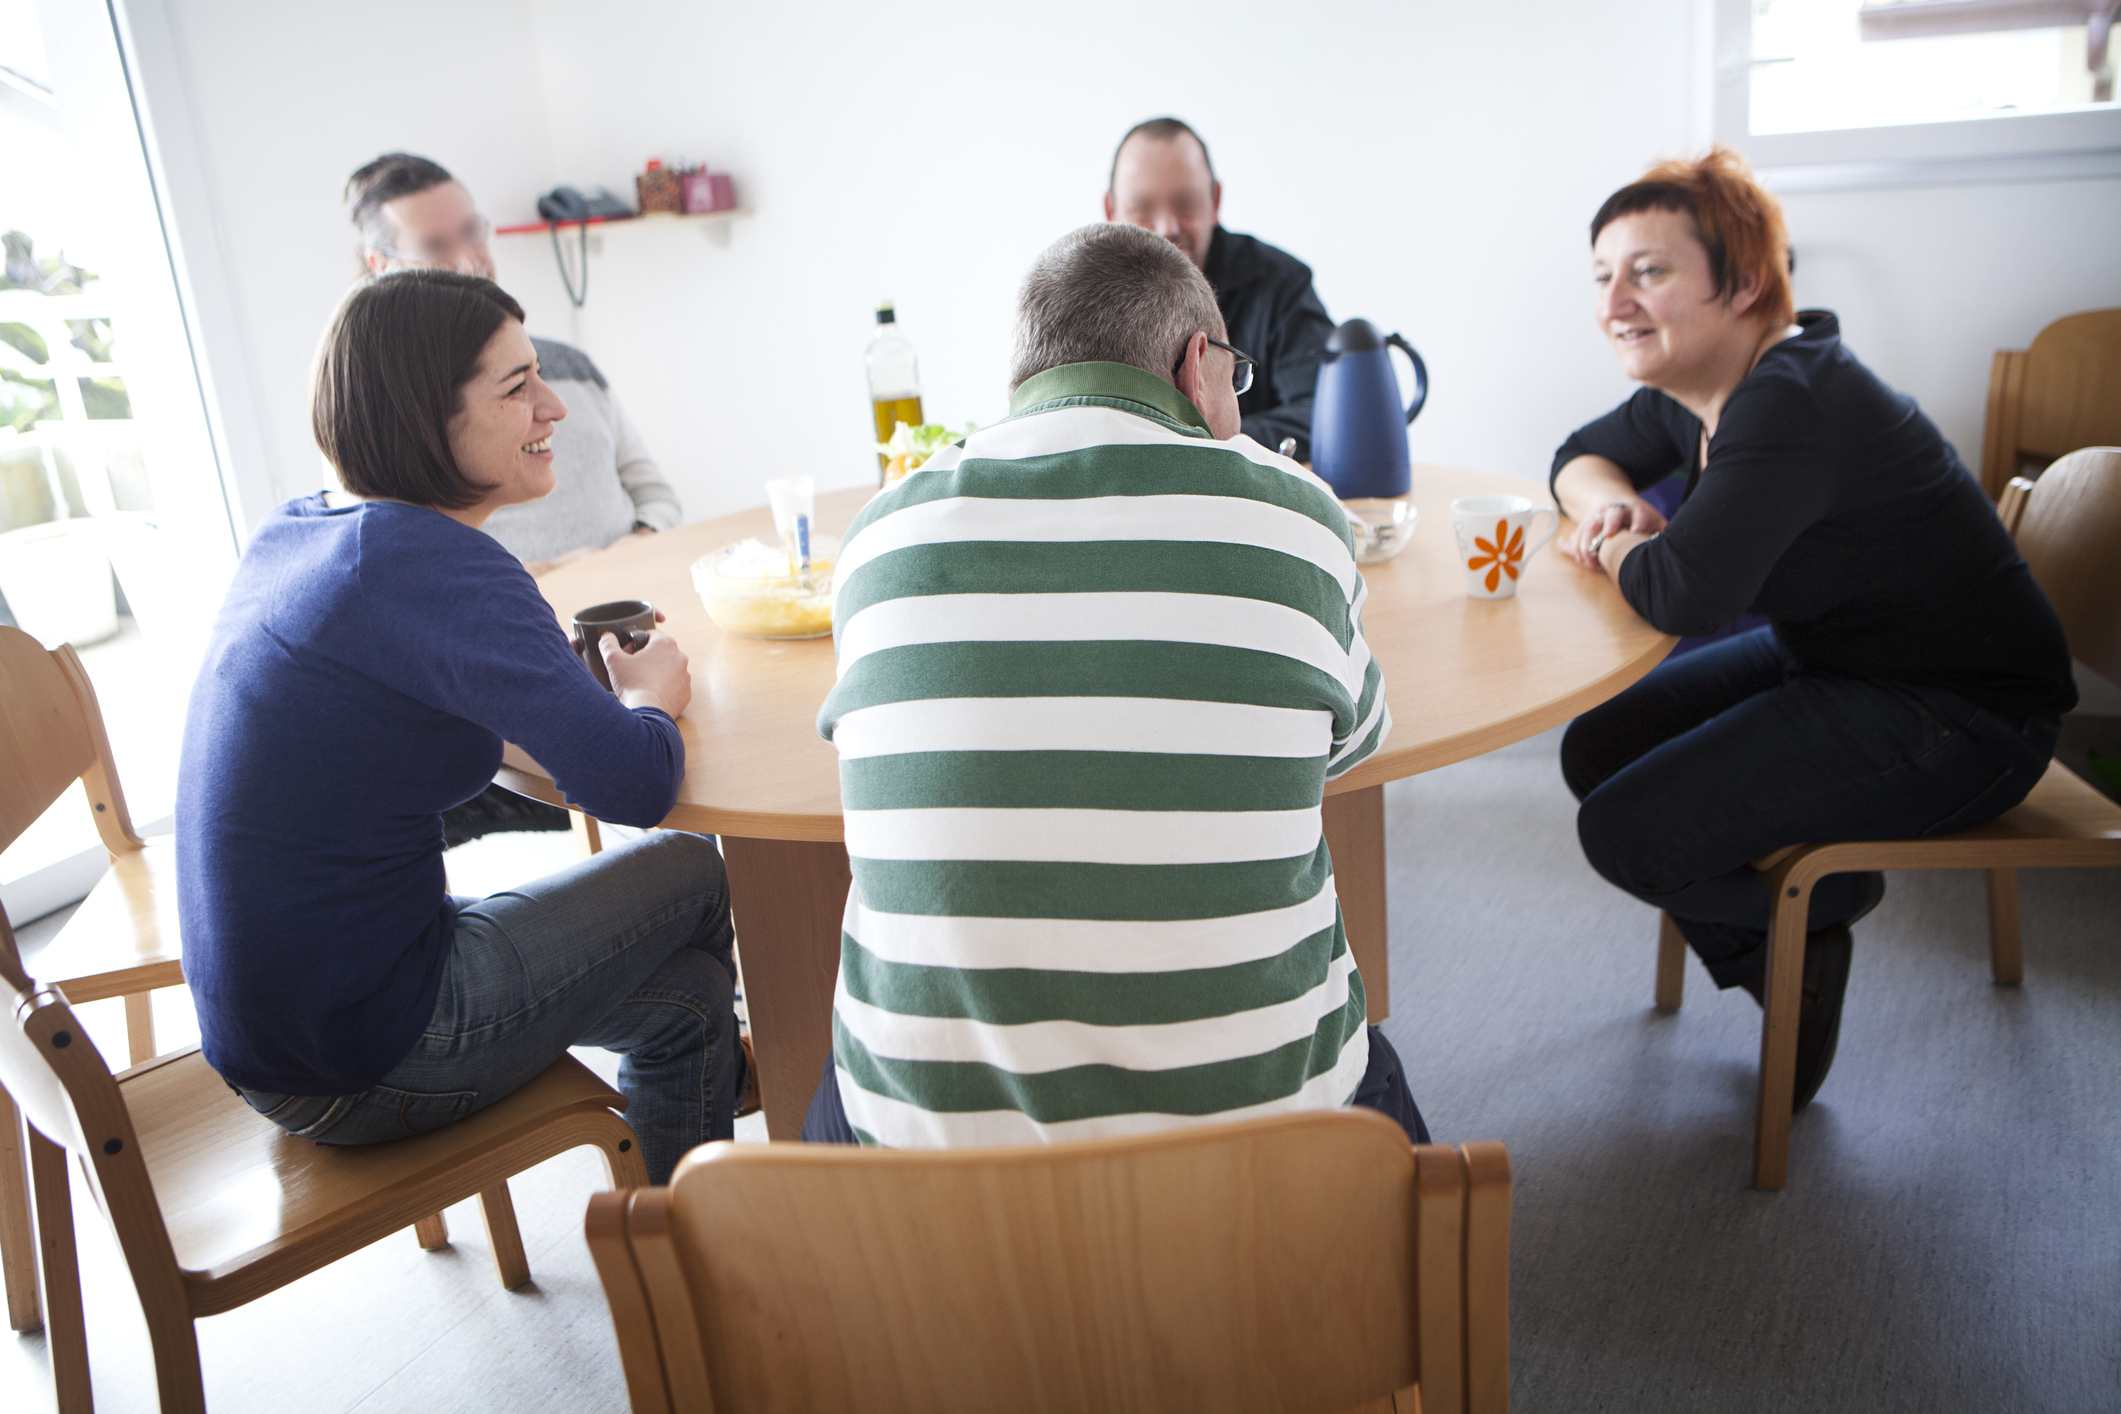 People Sitting Around Table